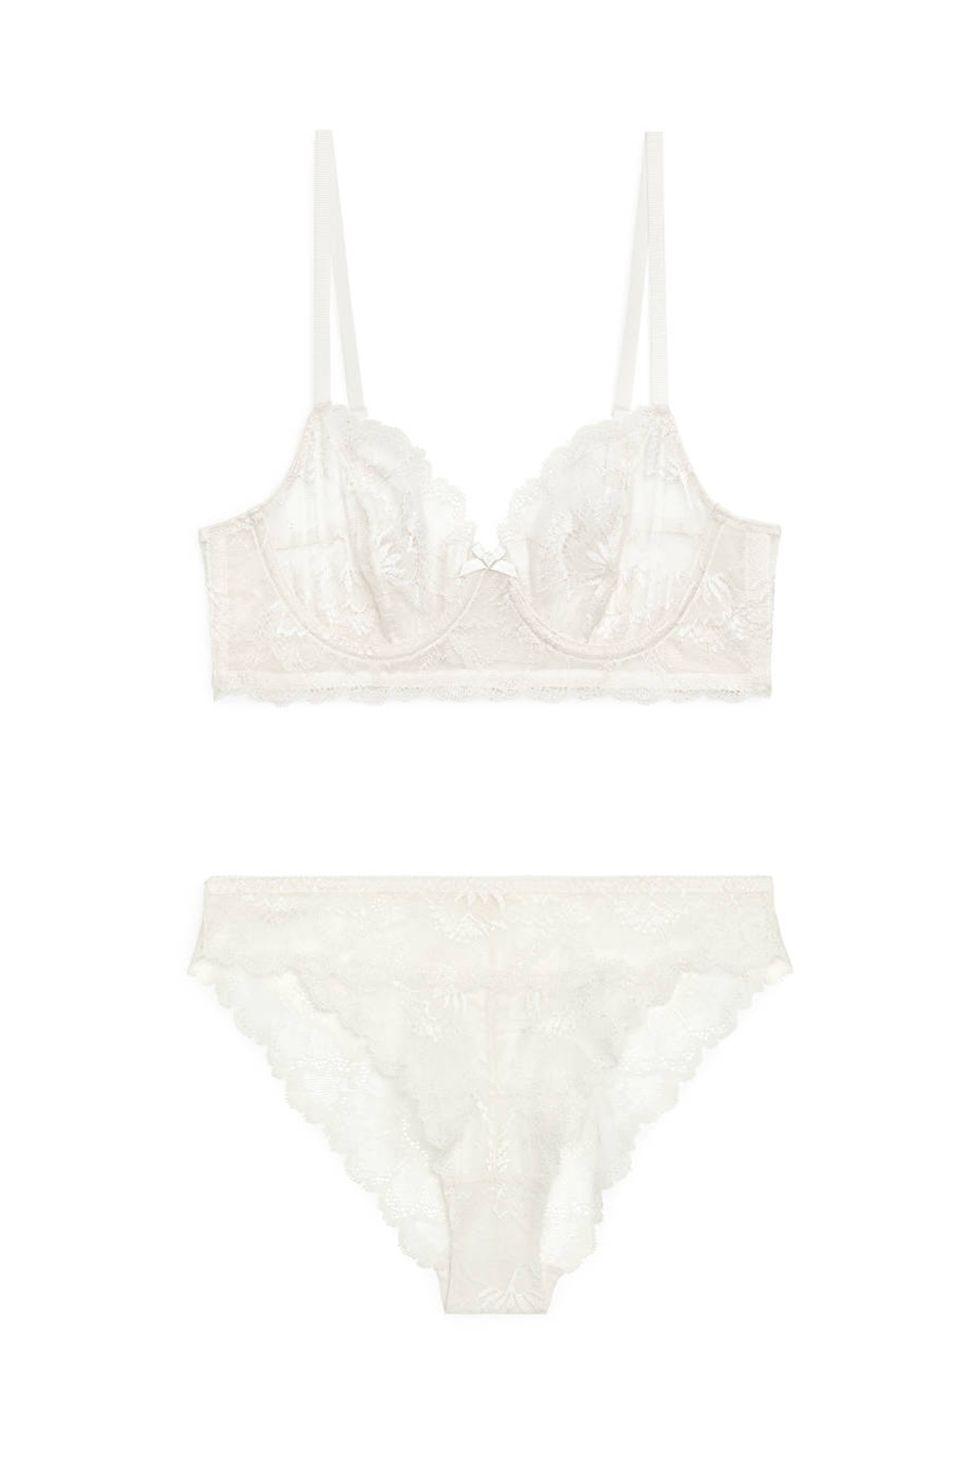 Arket, White lace bra and briefs set, сутиен за 76лв, бикини за 33лв